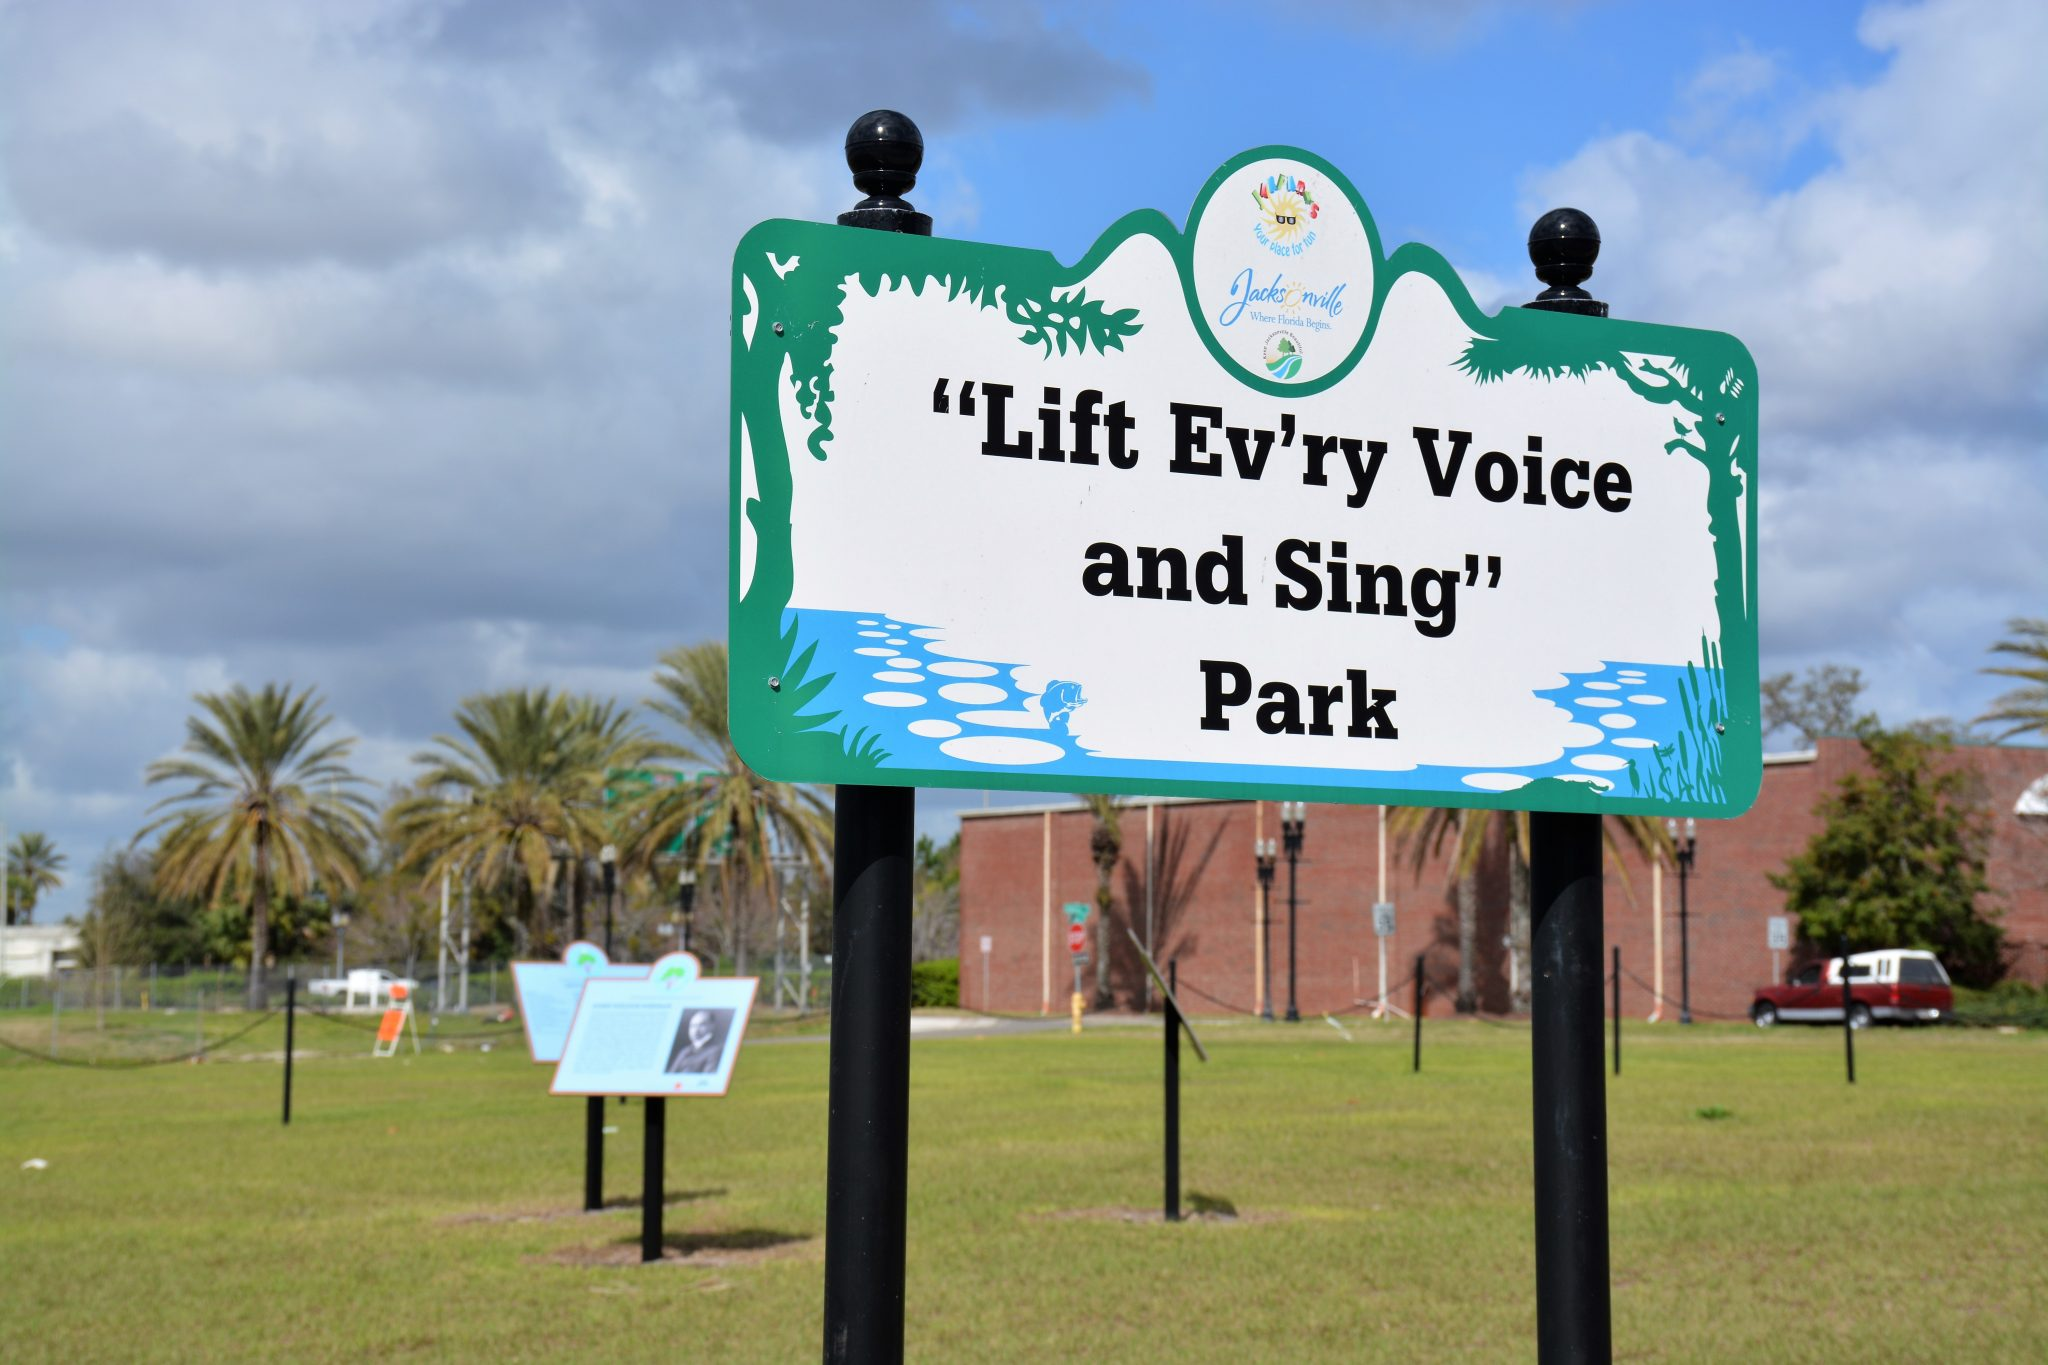 Lift Ev'ry Voice and Sing Park, Jacksonville, FL